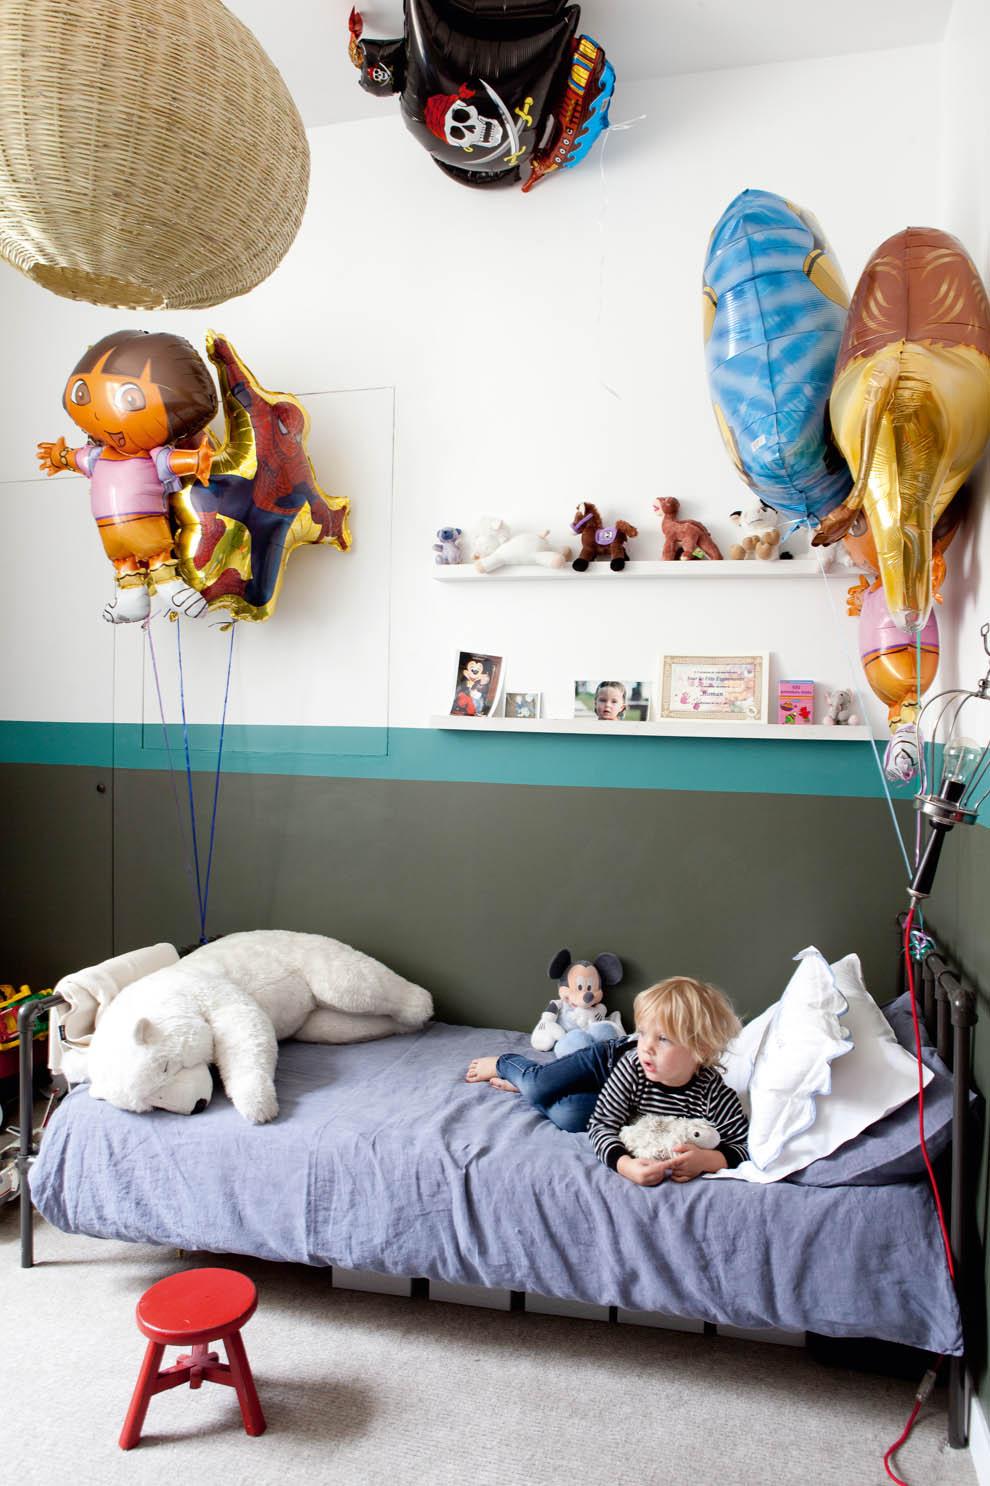 atelier rue verte le blog invitation chez sarah lavoine. Black Bedroom Furniture Sets. Home Design Ideas